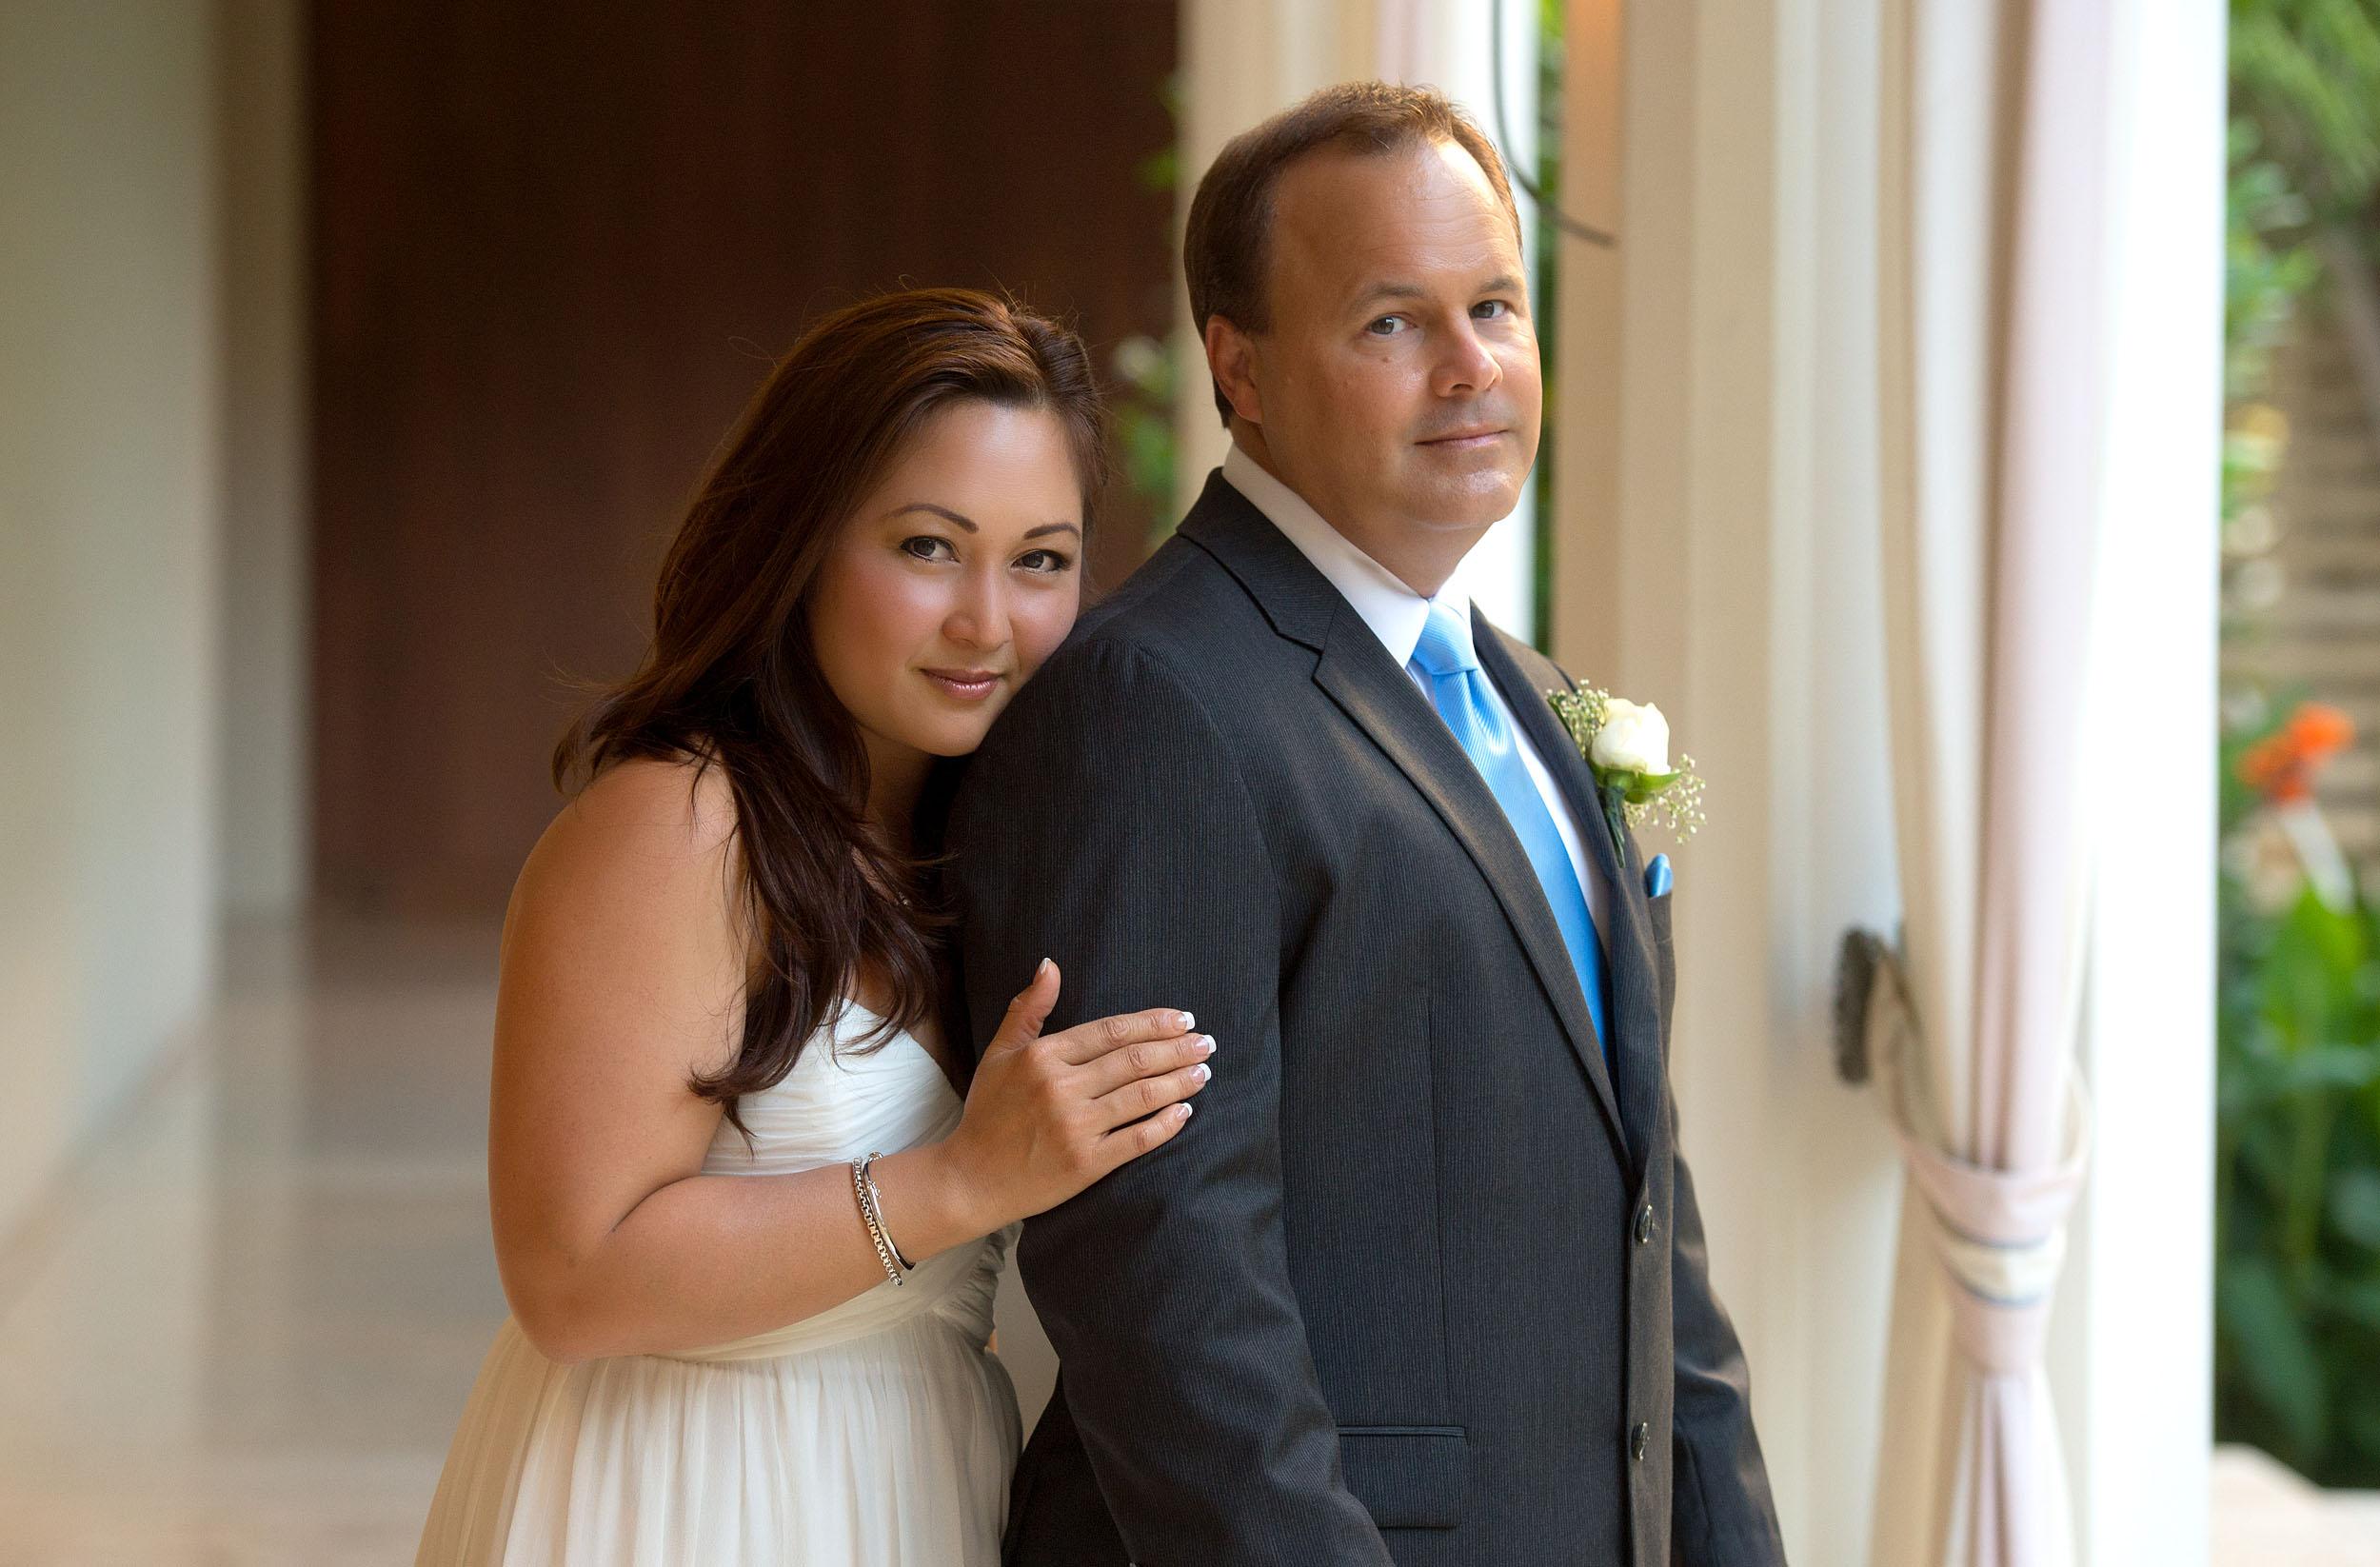 Bride and groom portrait at the Halekulani Hotel in Honolulu.